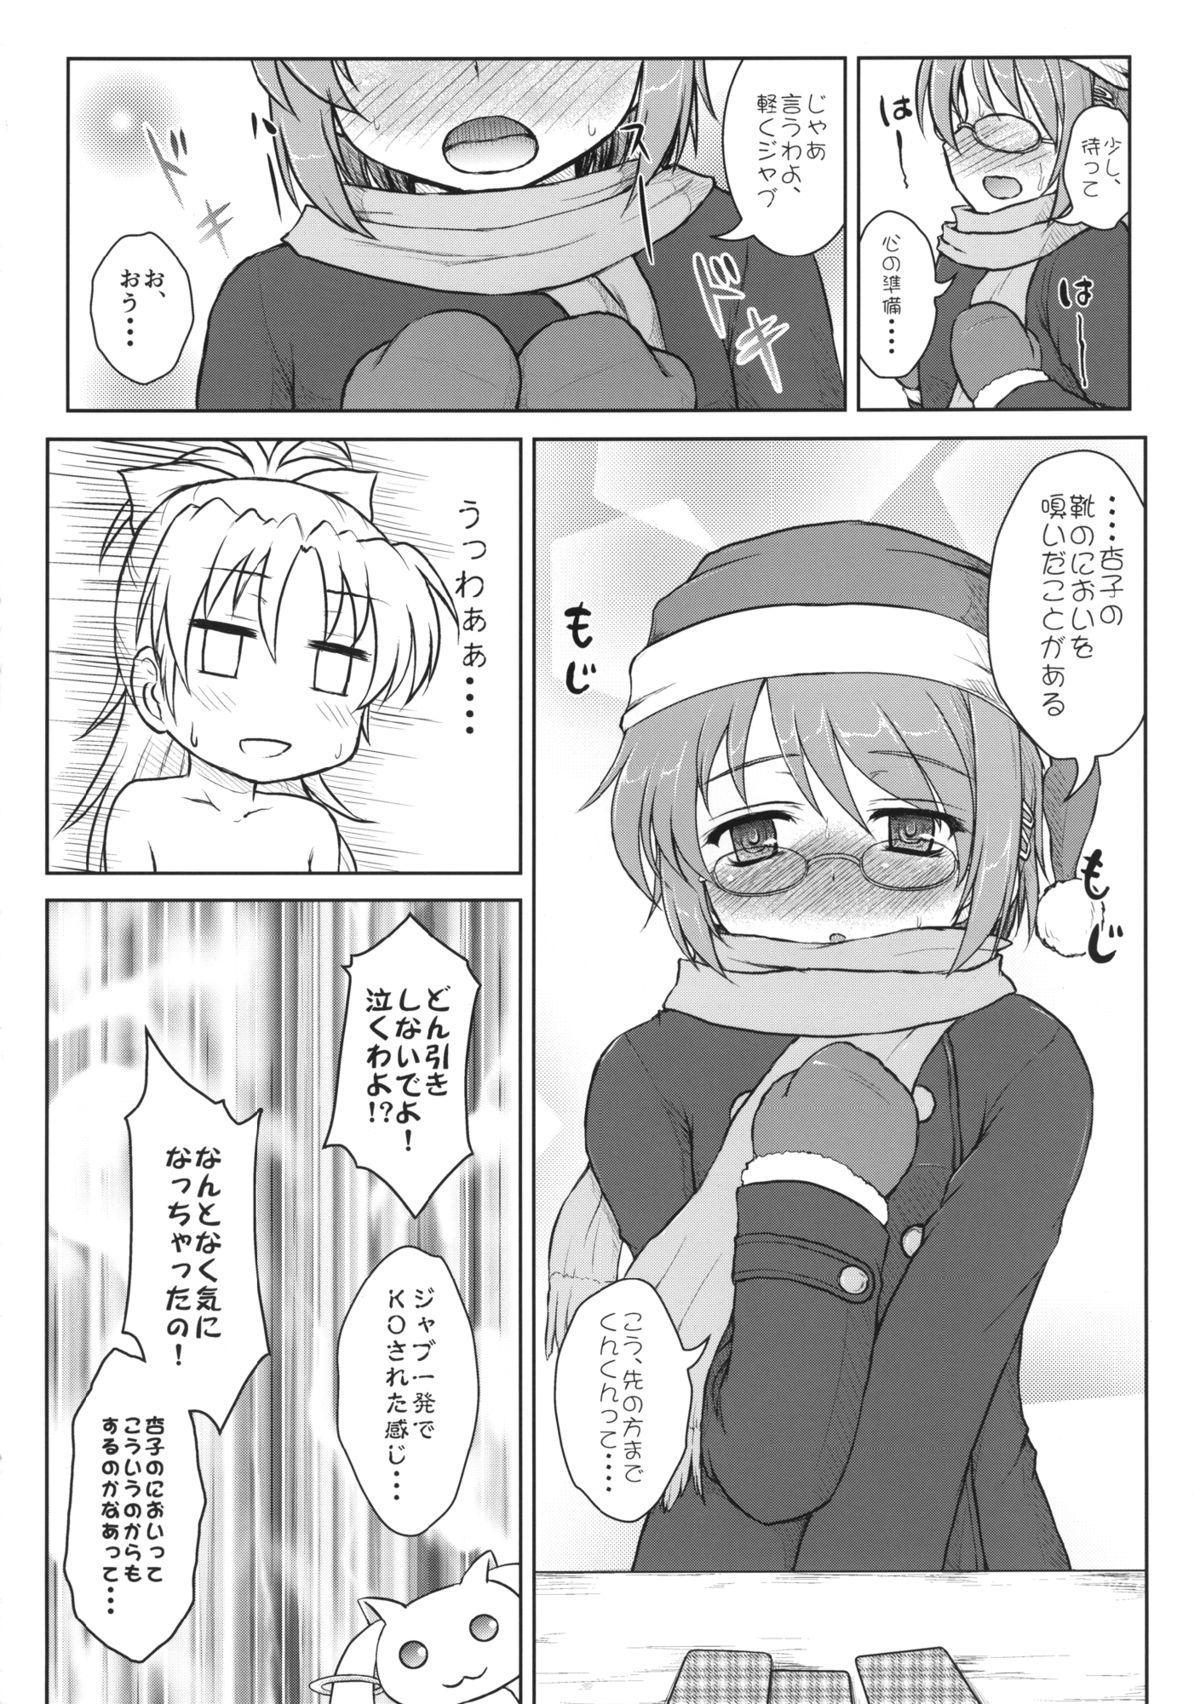 (SHT2013 Haru) [Newtype Kenkyuujo (Kotowari)] Sayaka-san to Kyouko-san (Puella Magi Madoka Magica) 19